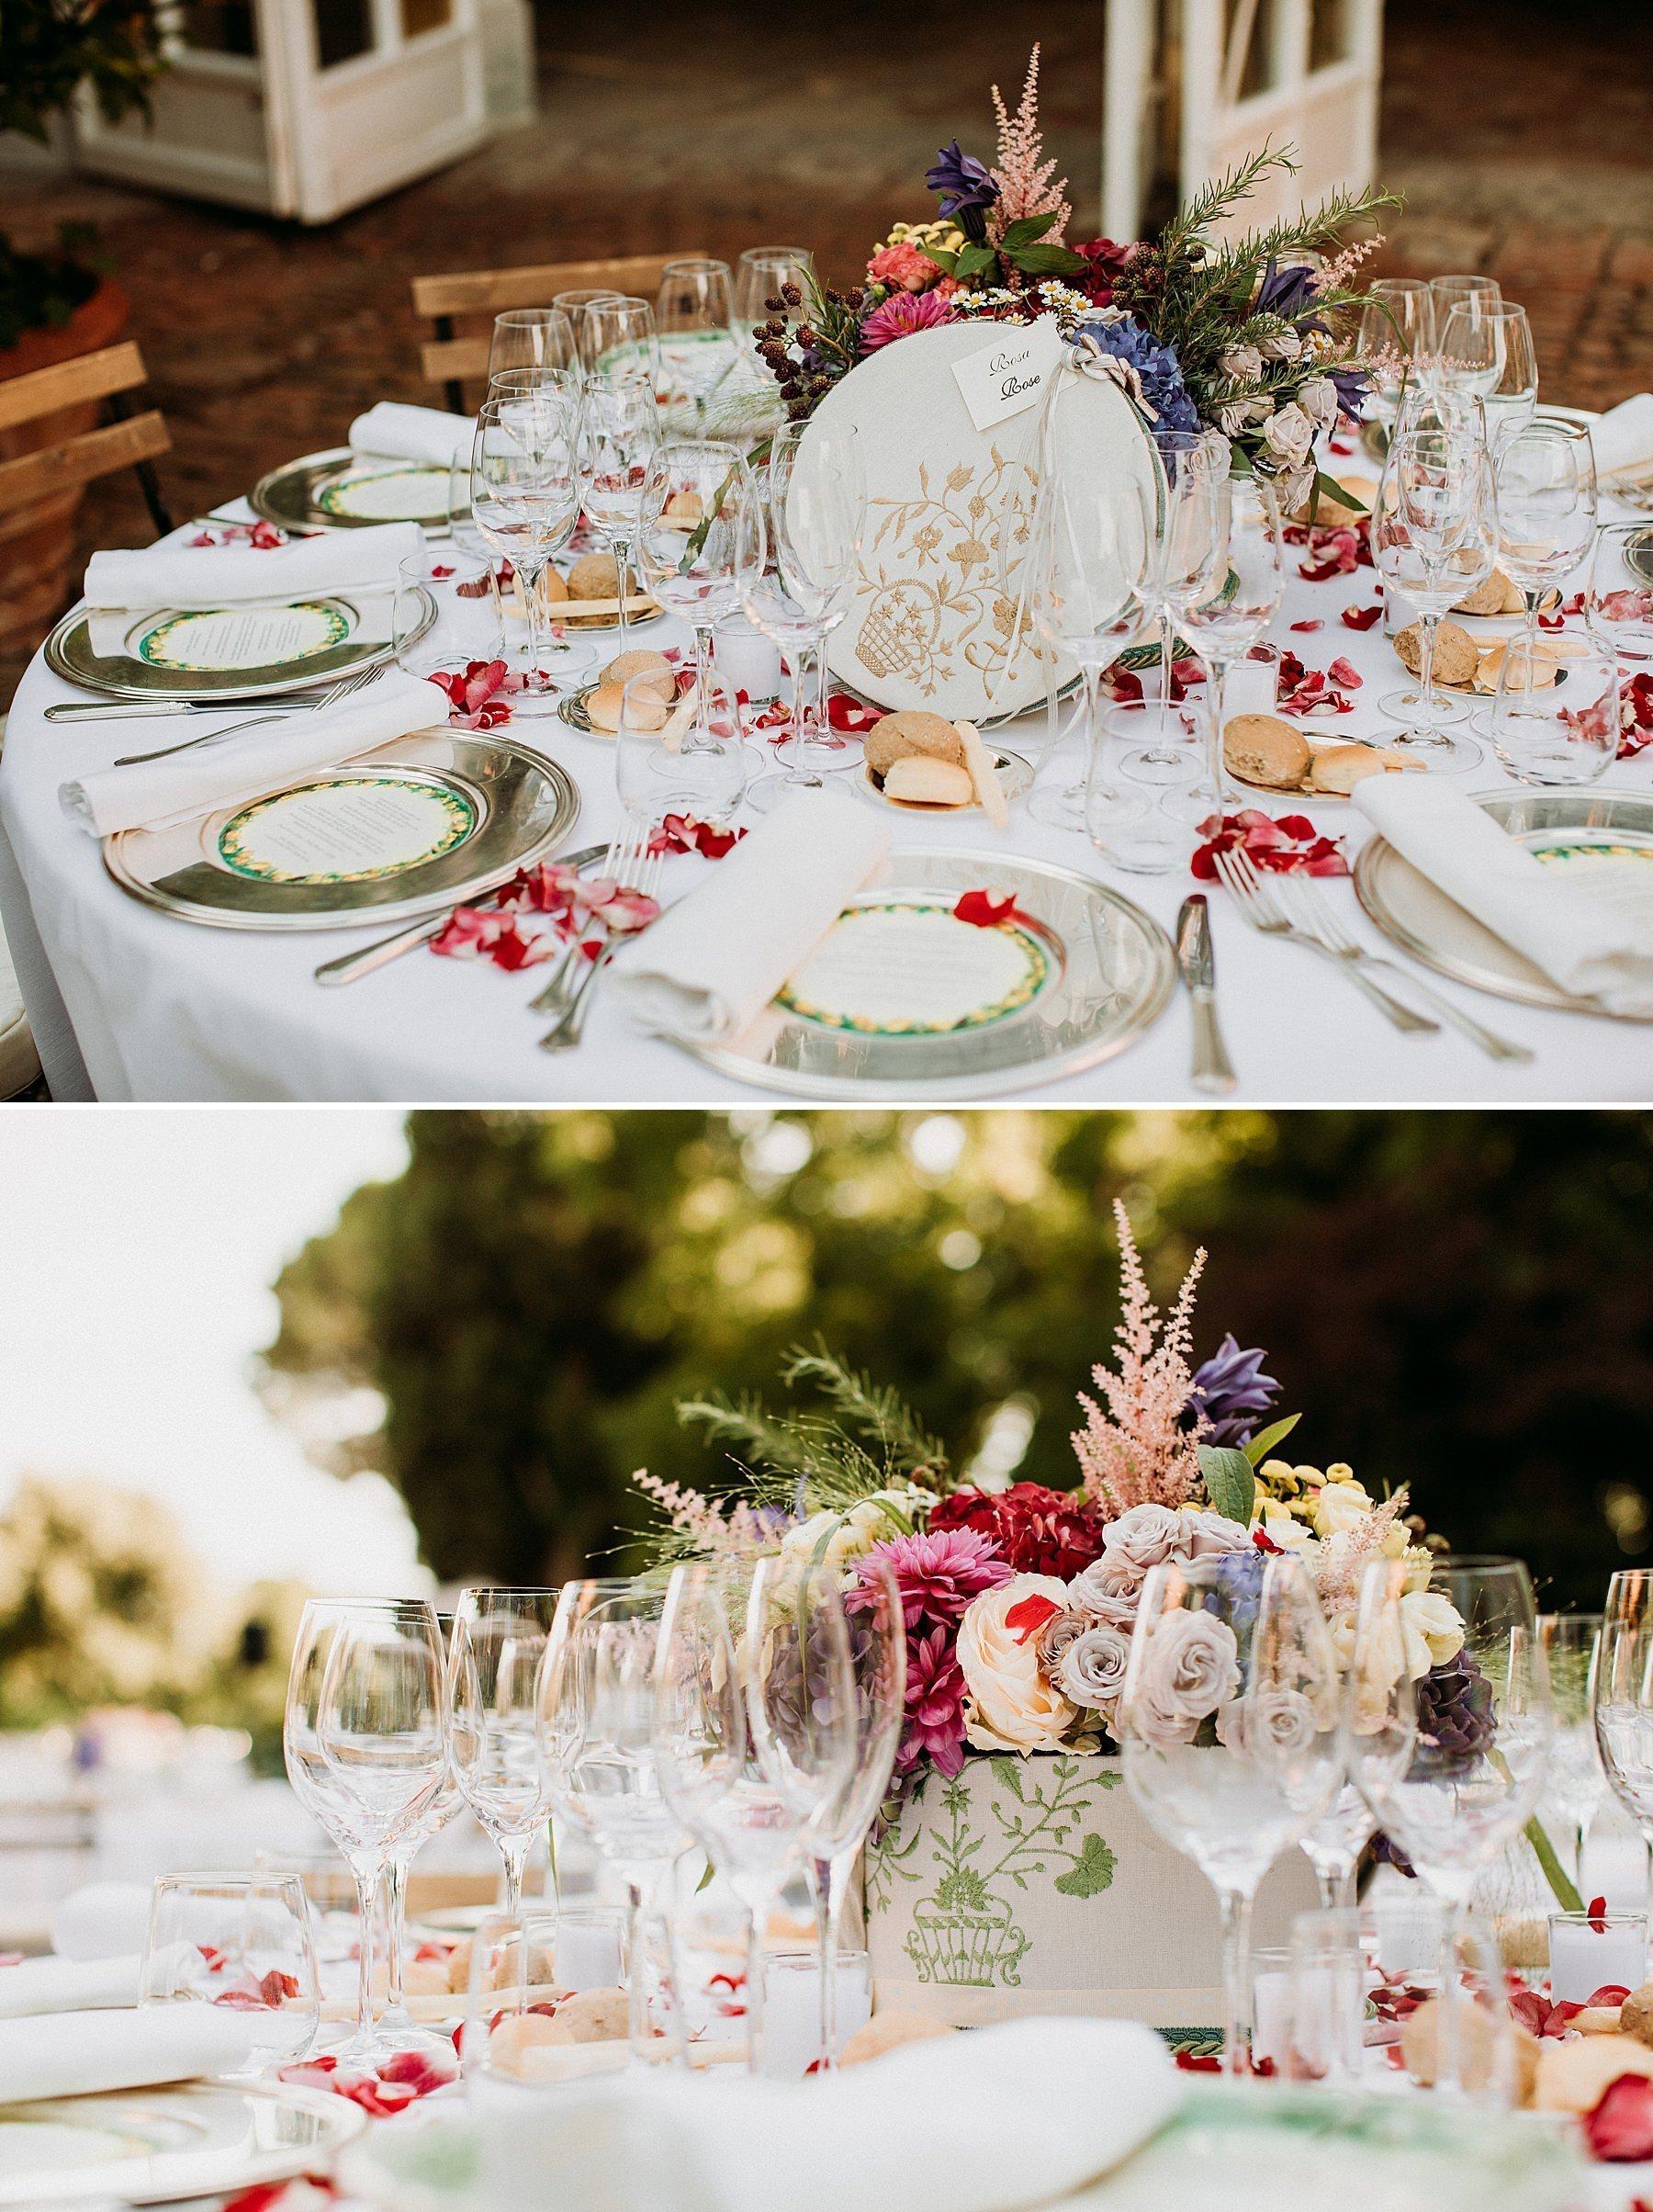 matrimonio a imola tenuta montericco allestimento cena simona xella